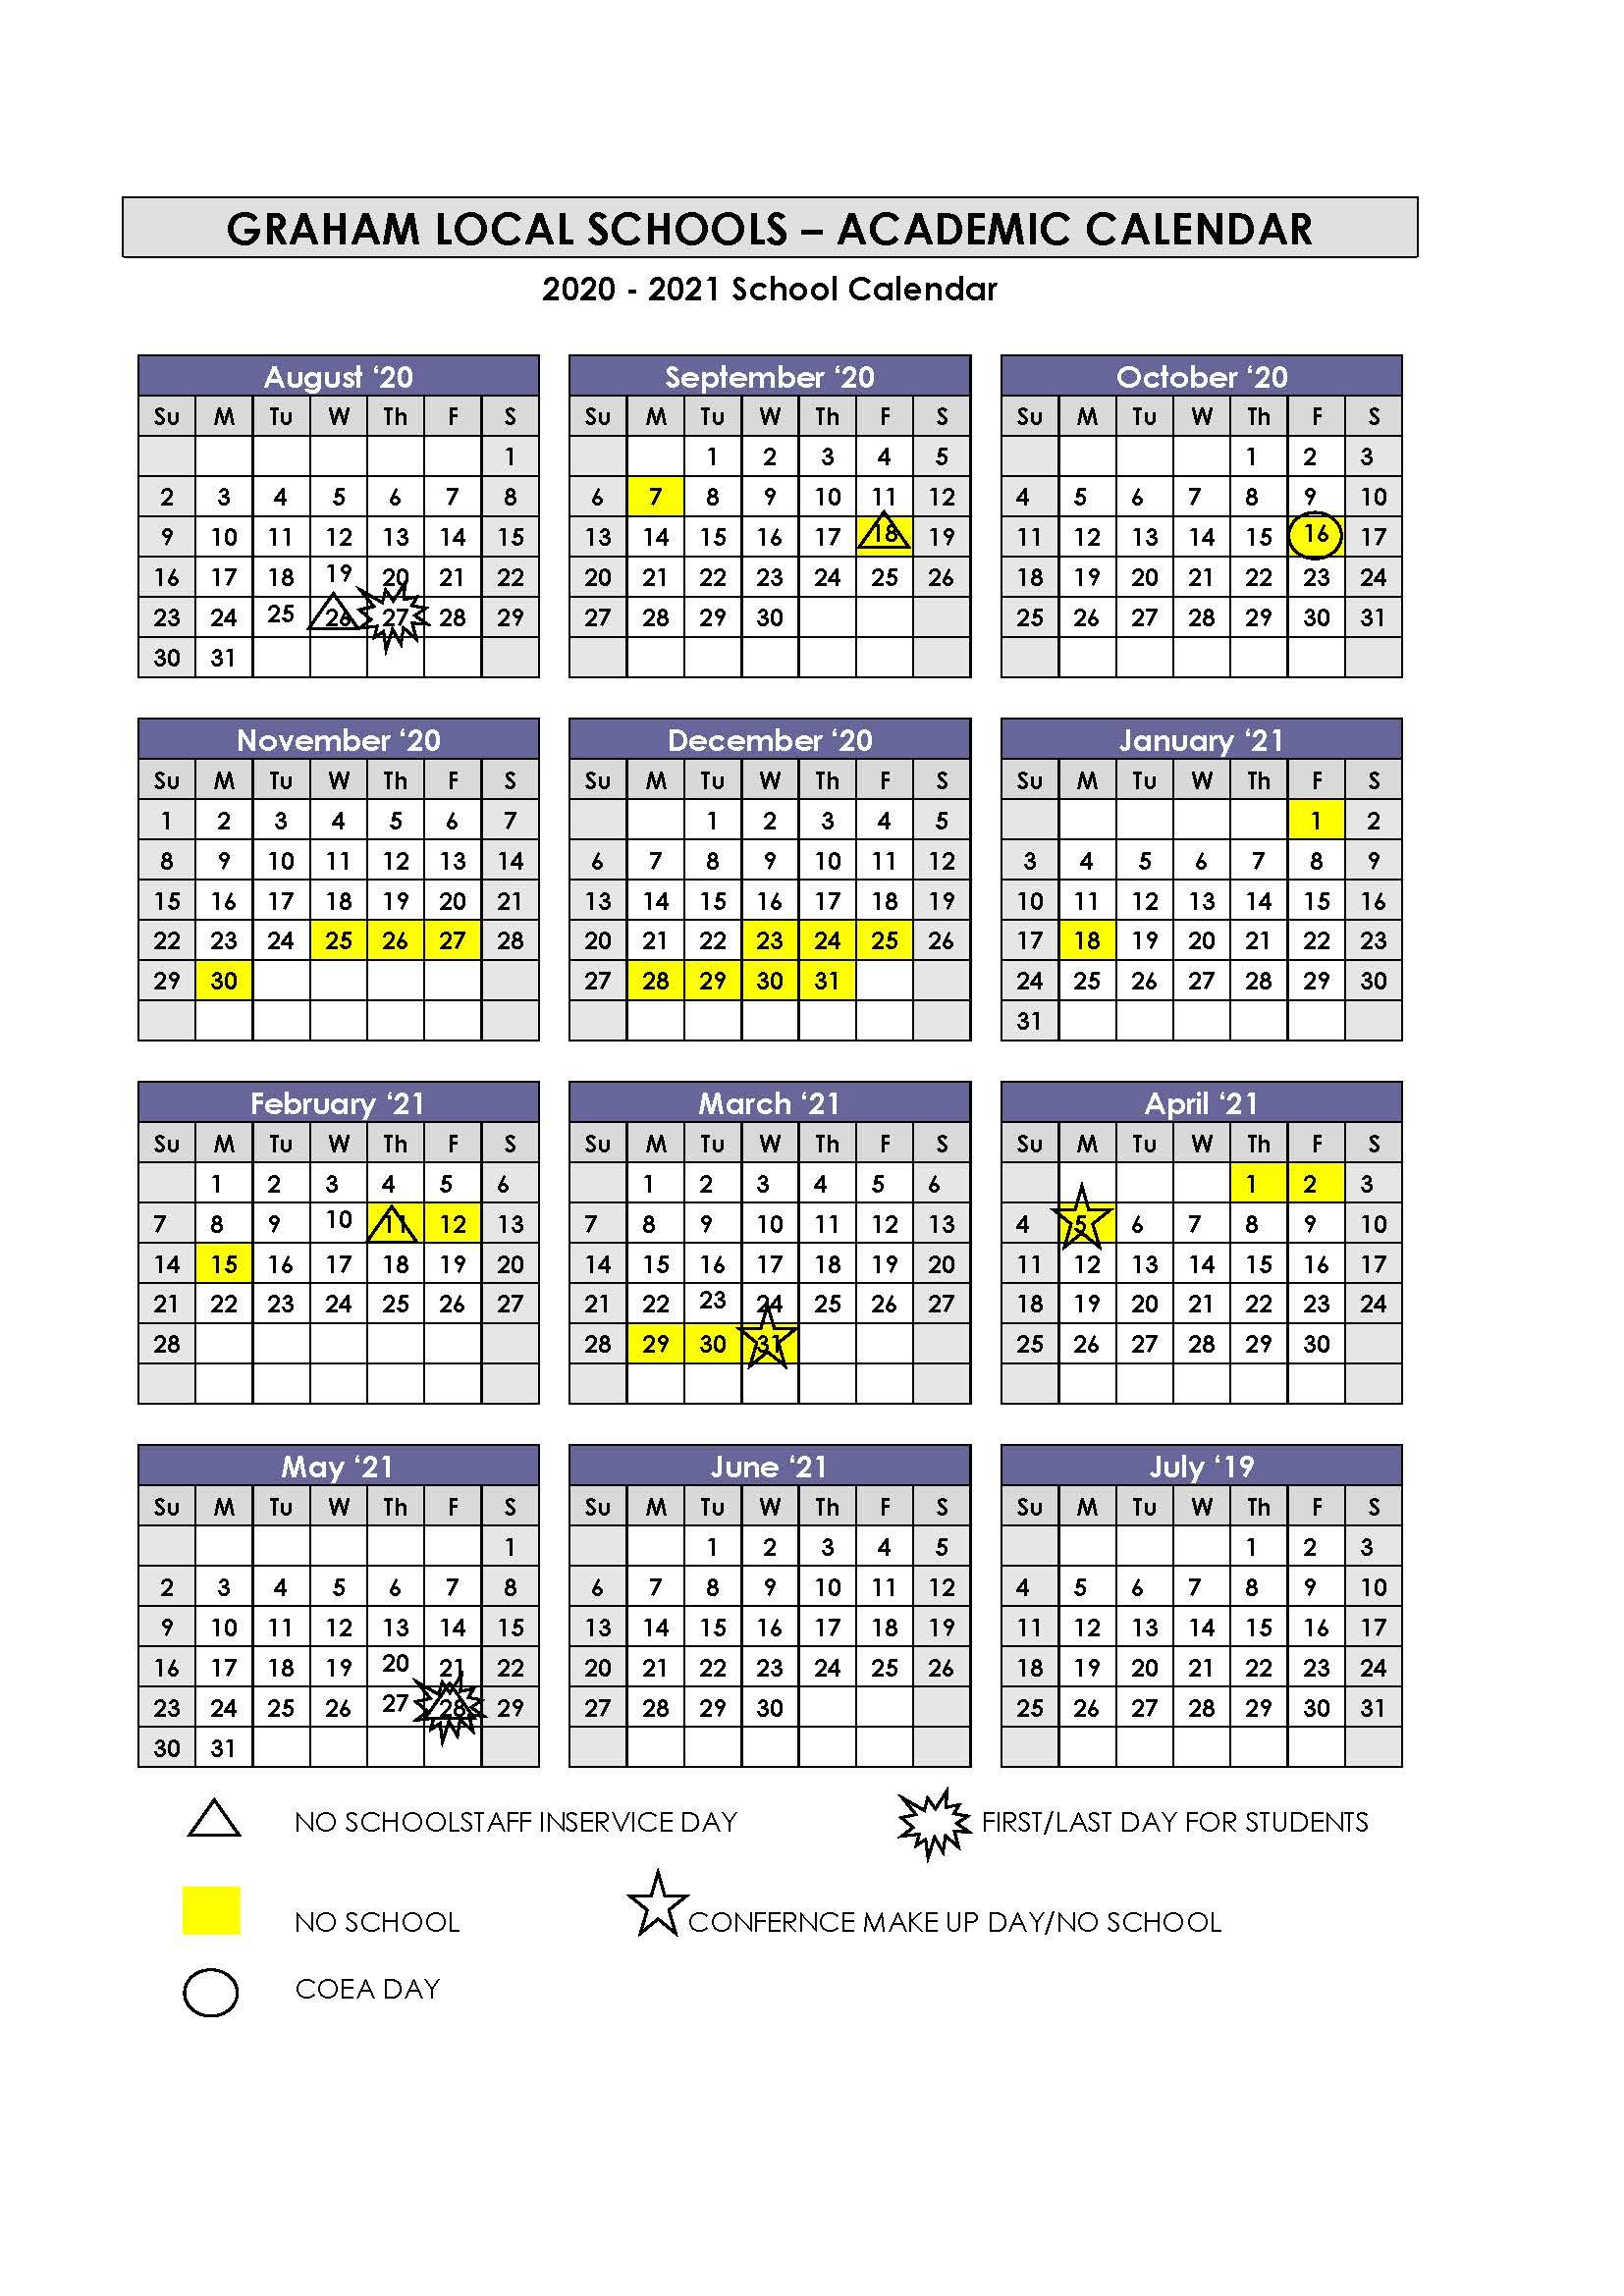 Calendar In 2021 Calendar For Bowing Green City Schools